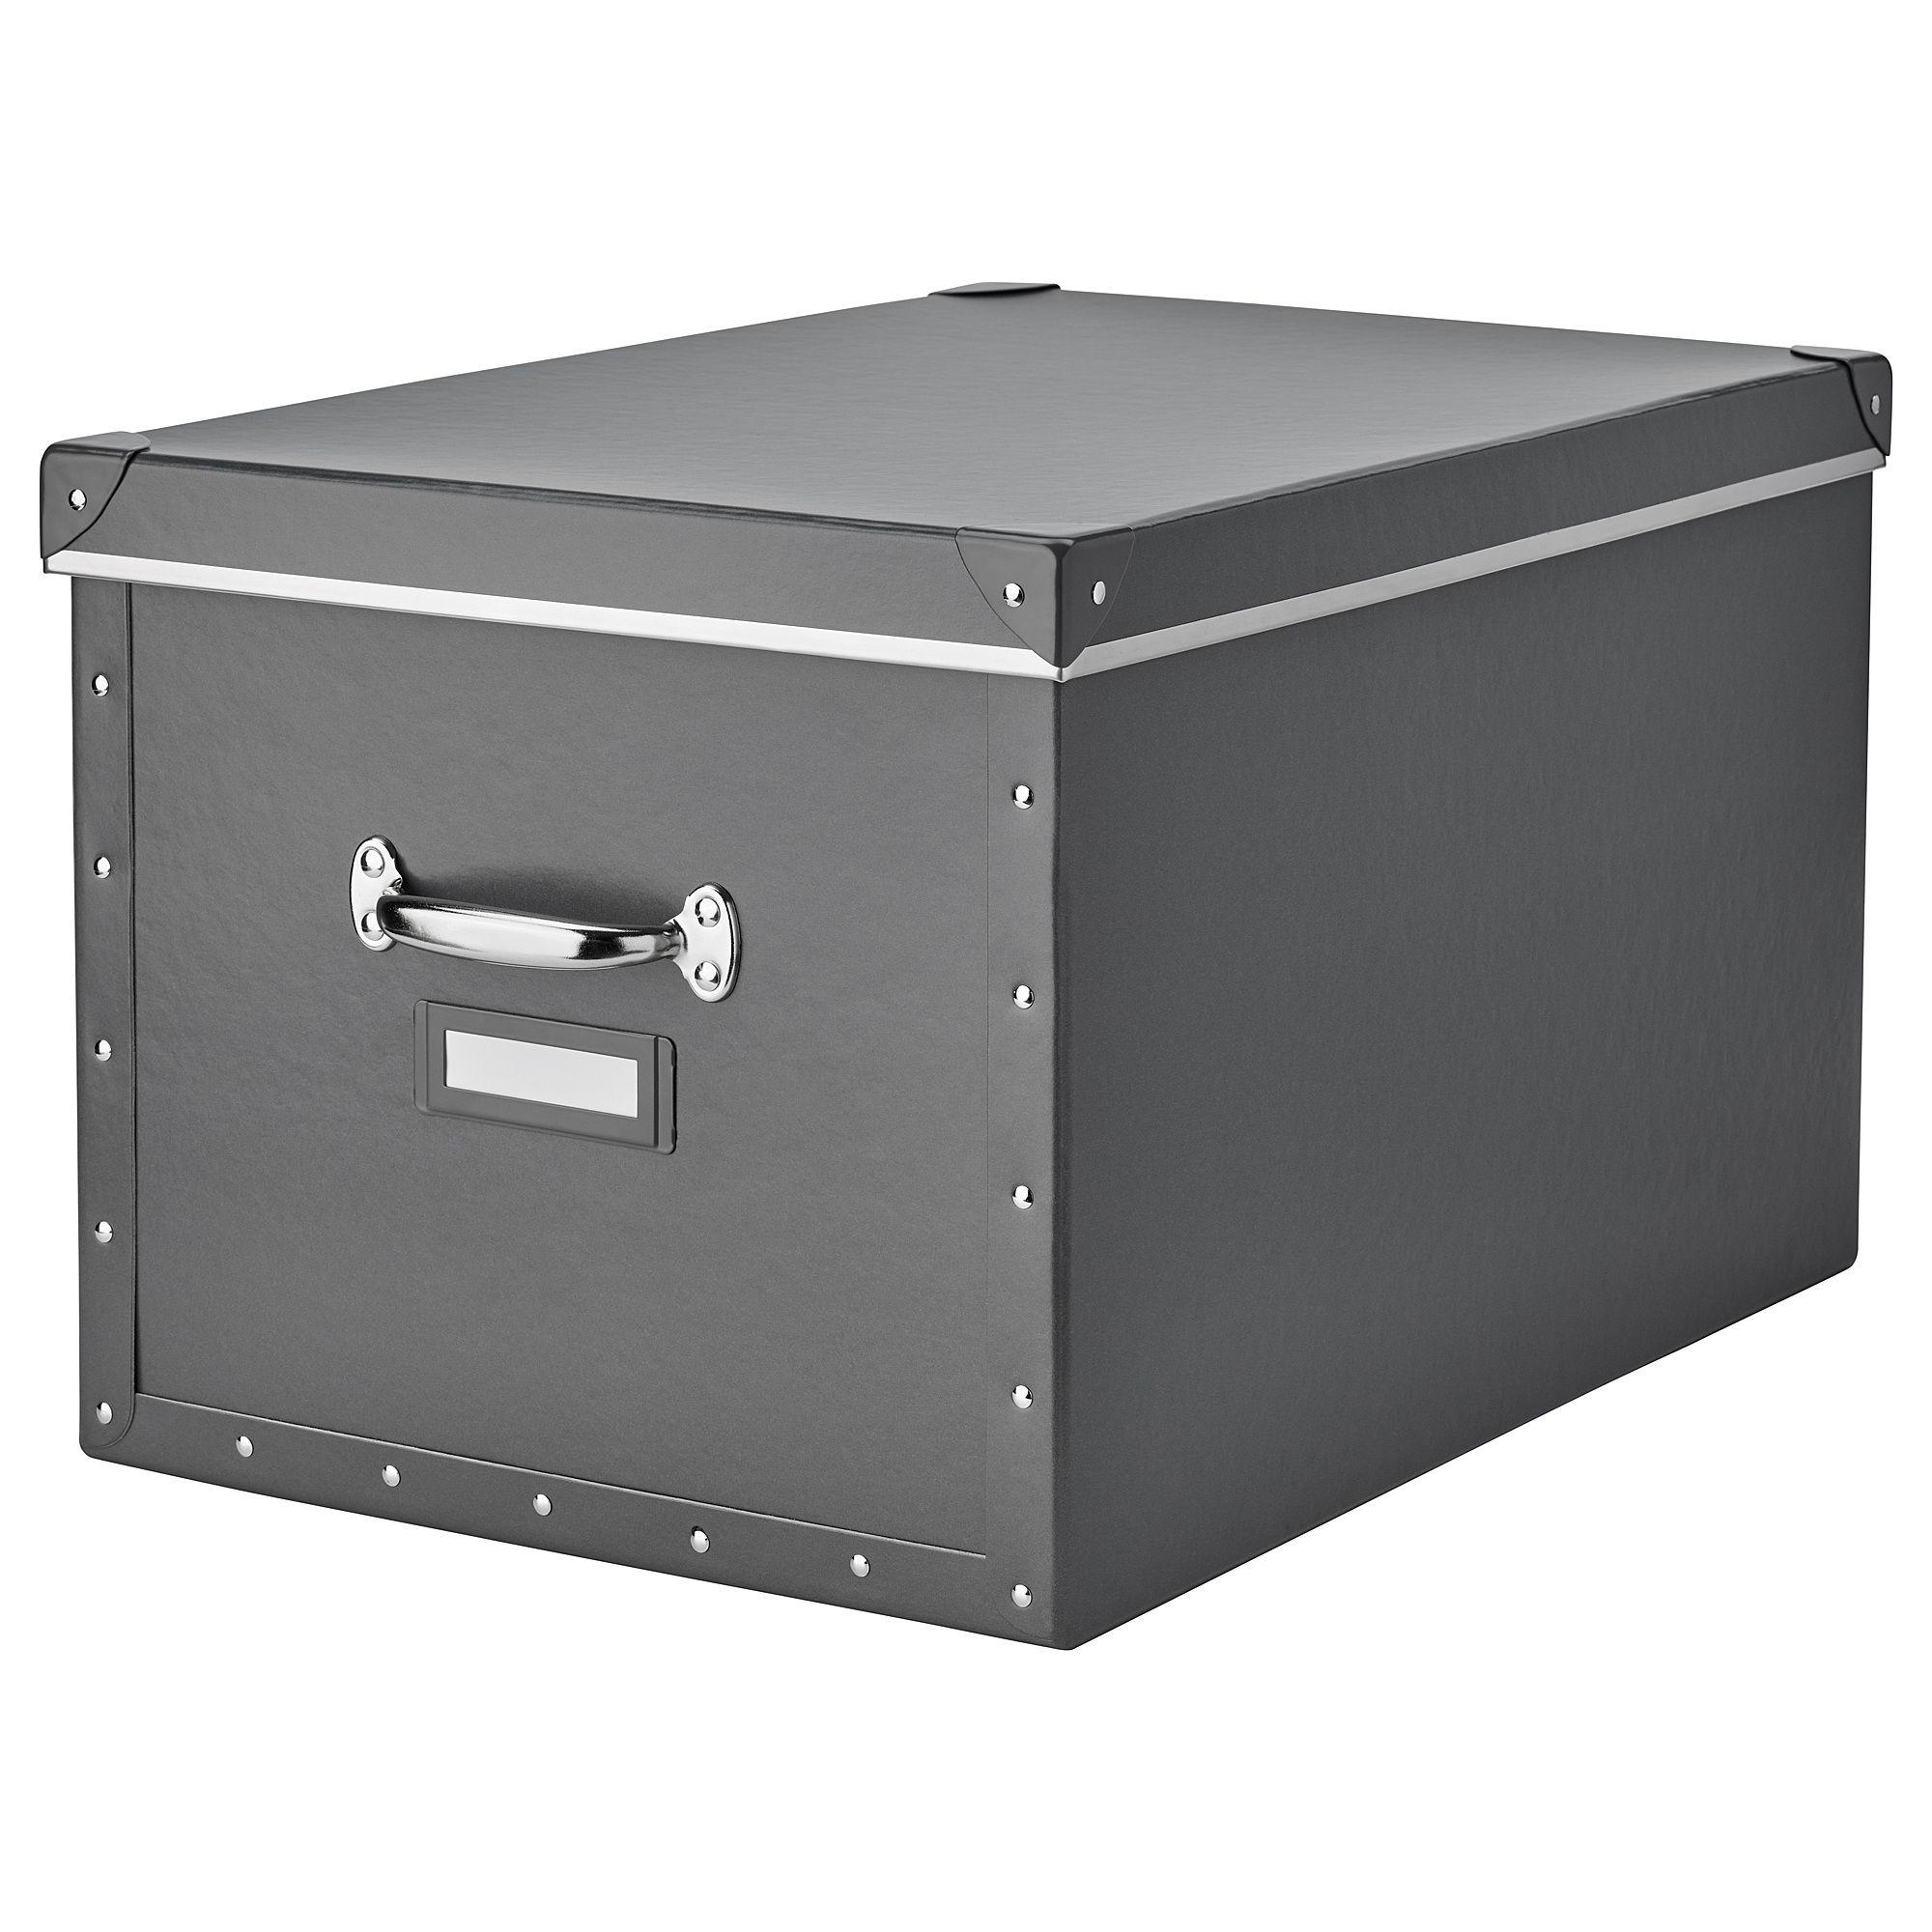 FJÄLLA dark grey, Storage box with lid, 35x56x30 cm IKEA